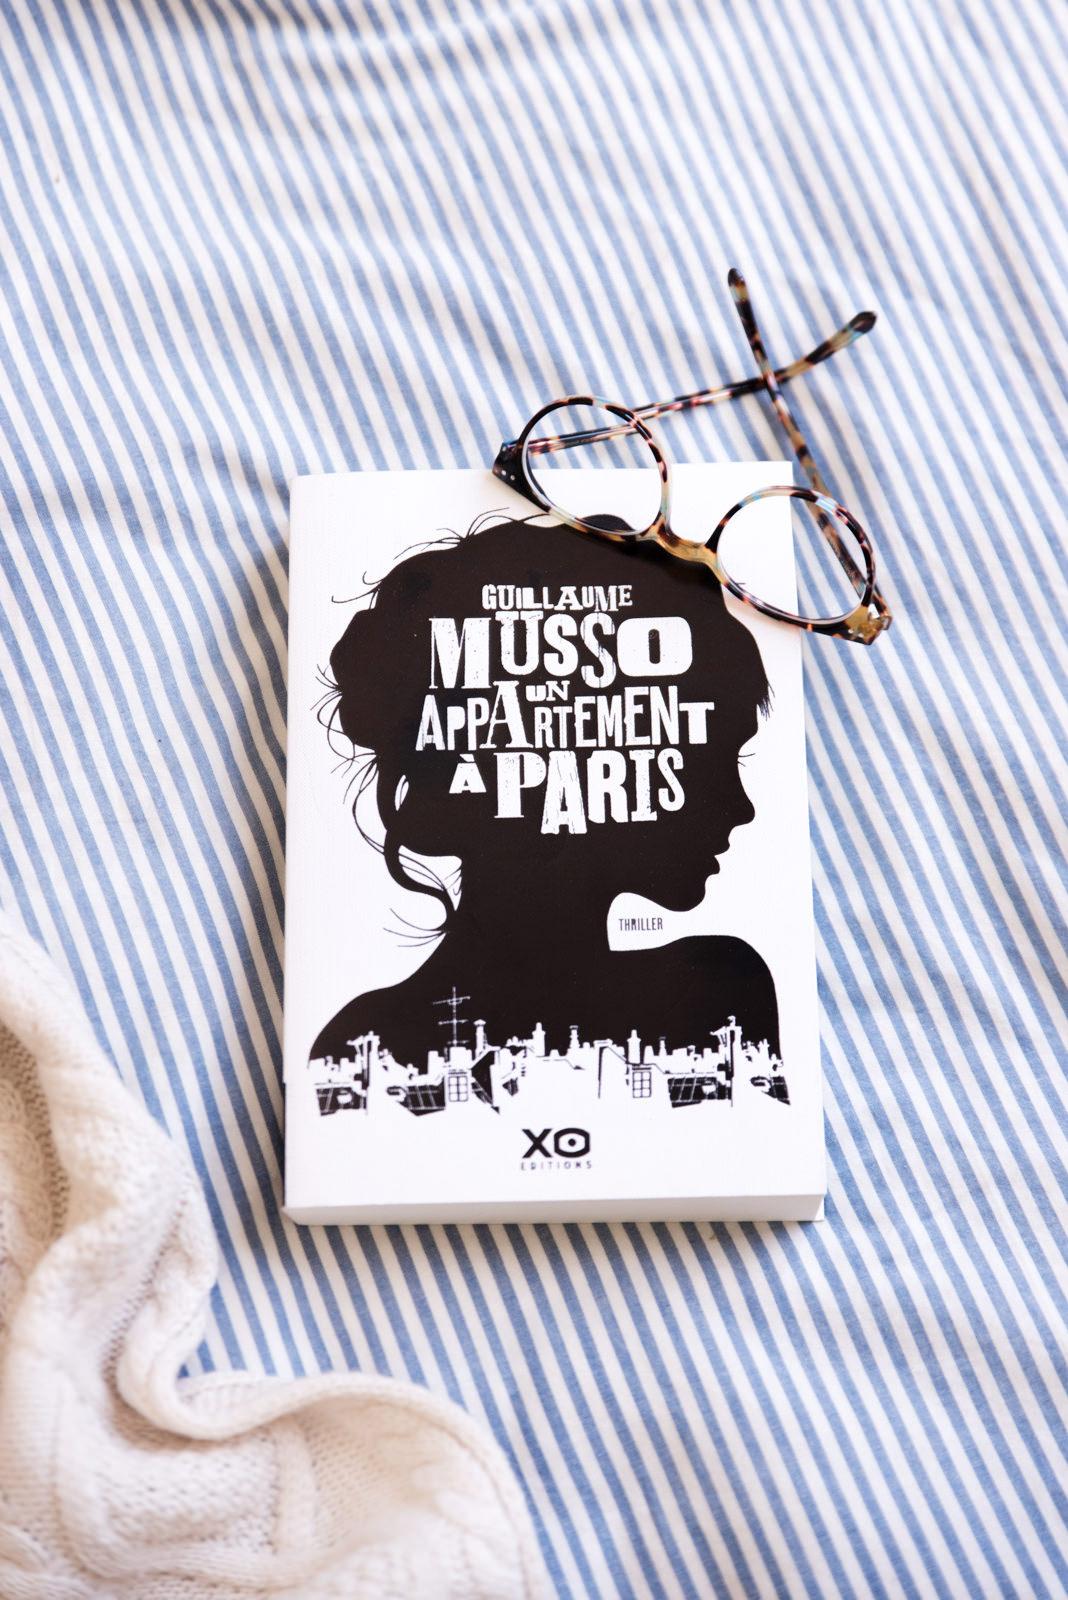 Blog-Mode-And-The-City-Lifestyle-Cinq-Petites-Choses-216-Guillaume-Musso-Appartement-Paris